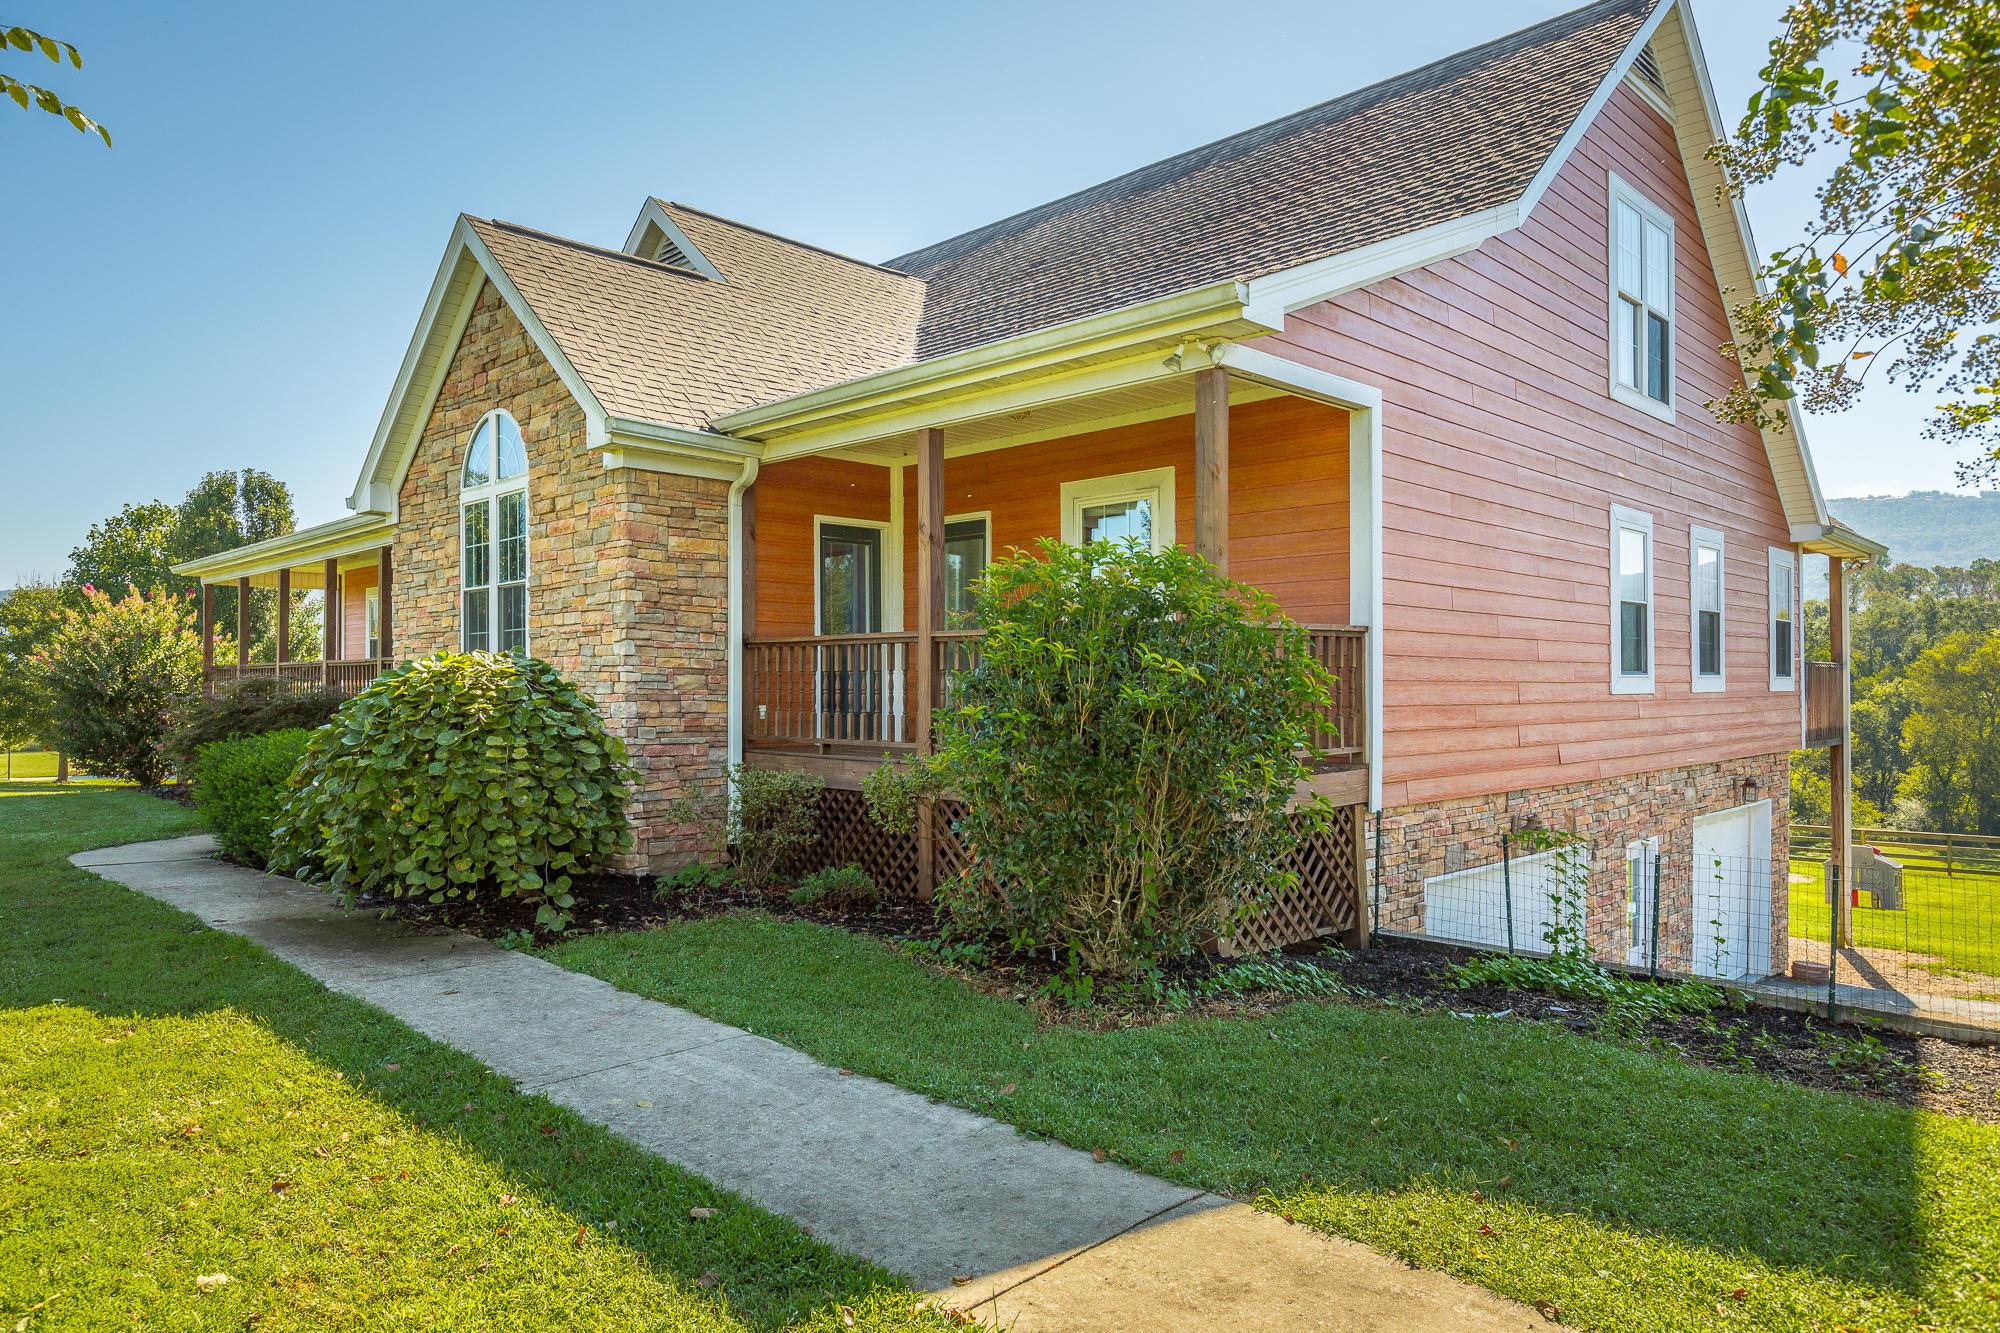 679 Neal Rd, Dunlap, TN 37327